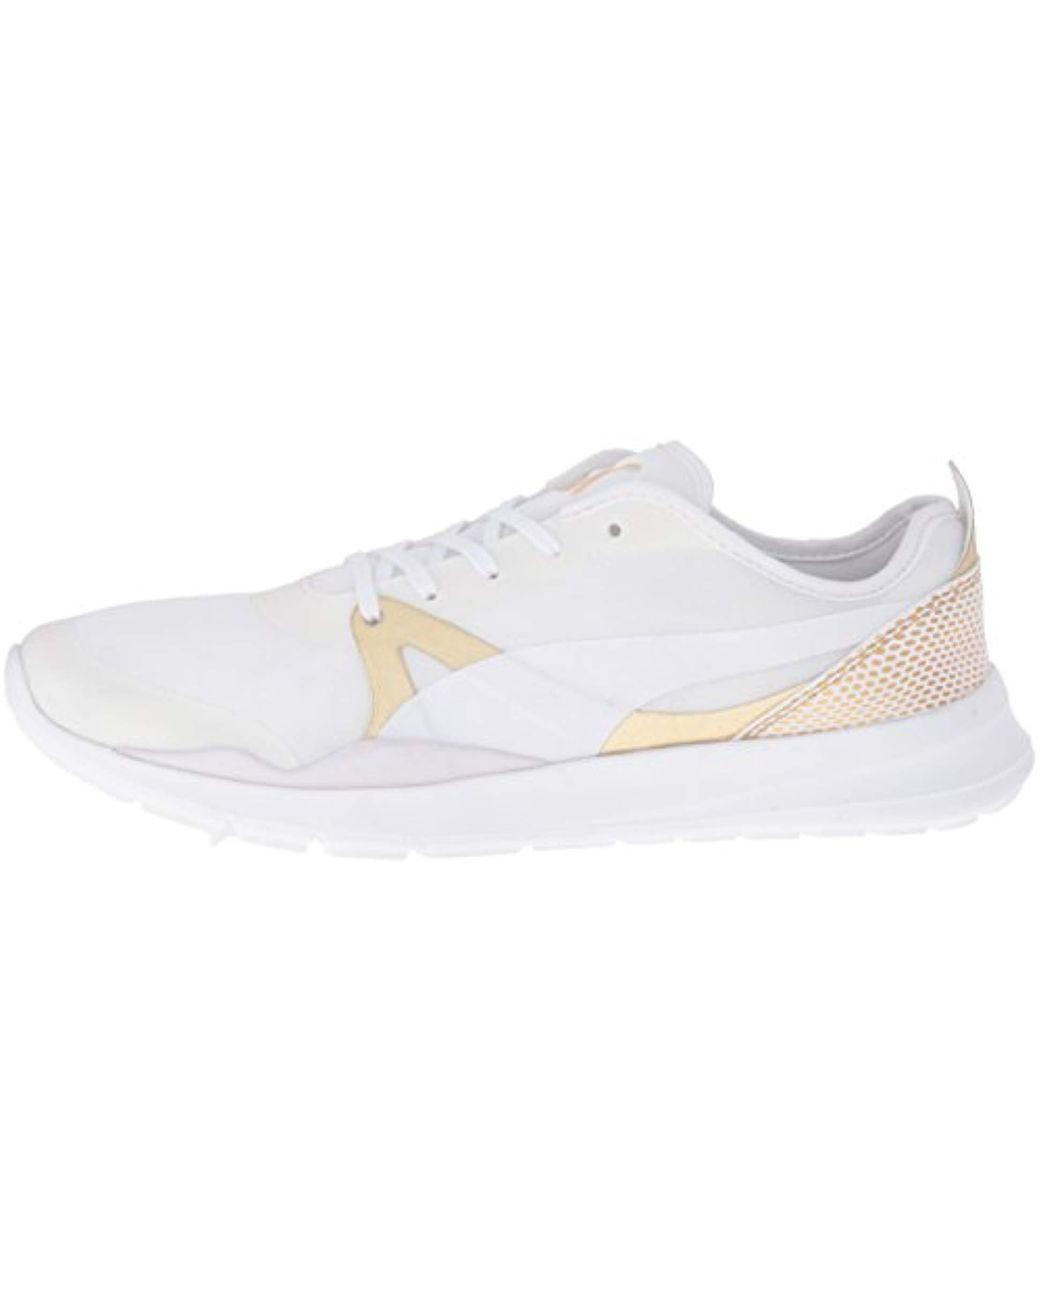 Puma Evo Gold Duplex Sneaker Women's, weiß gold, 5.0 UK